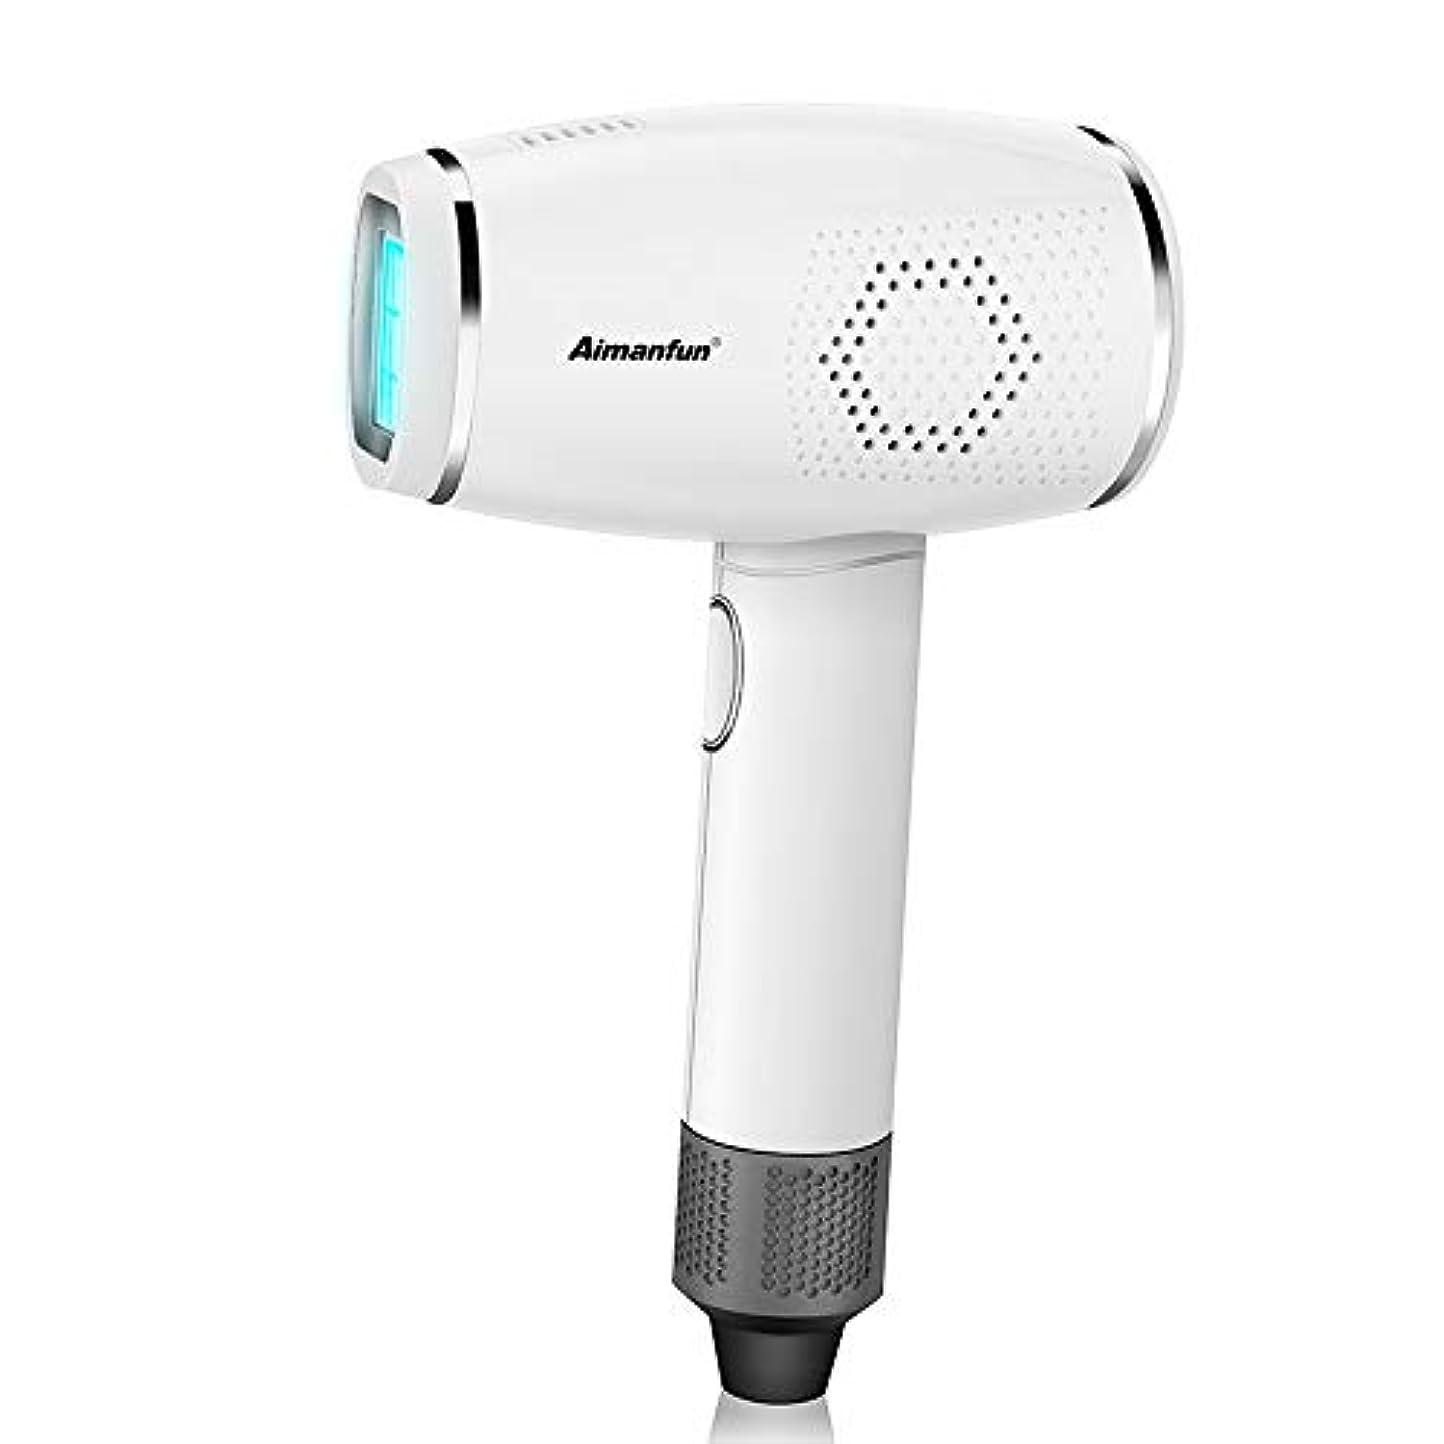 IPL脱毛システム用女性男性ボディフェイス、ホーム電動痛みのないアイスクールエピレータ永久的な脱毛装置付きタッチ液晶画面